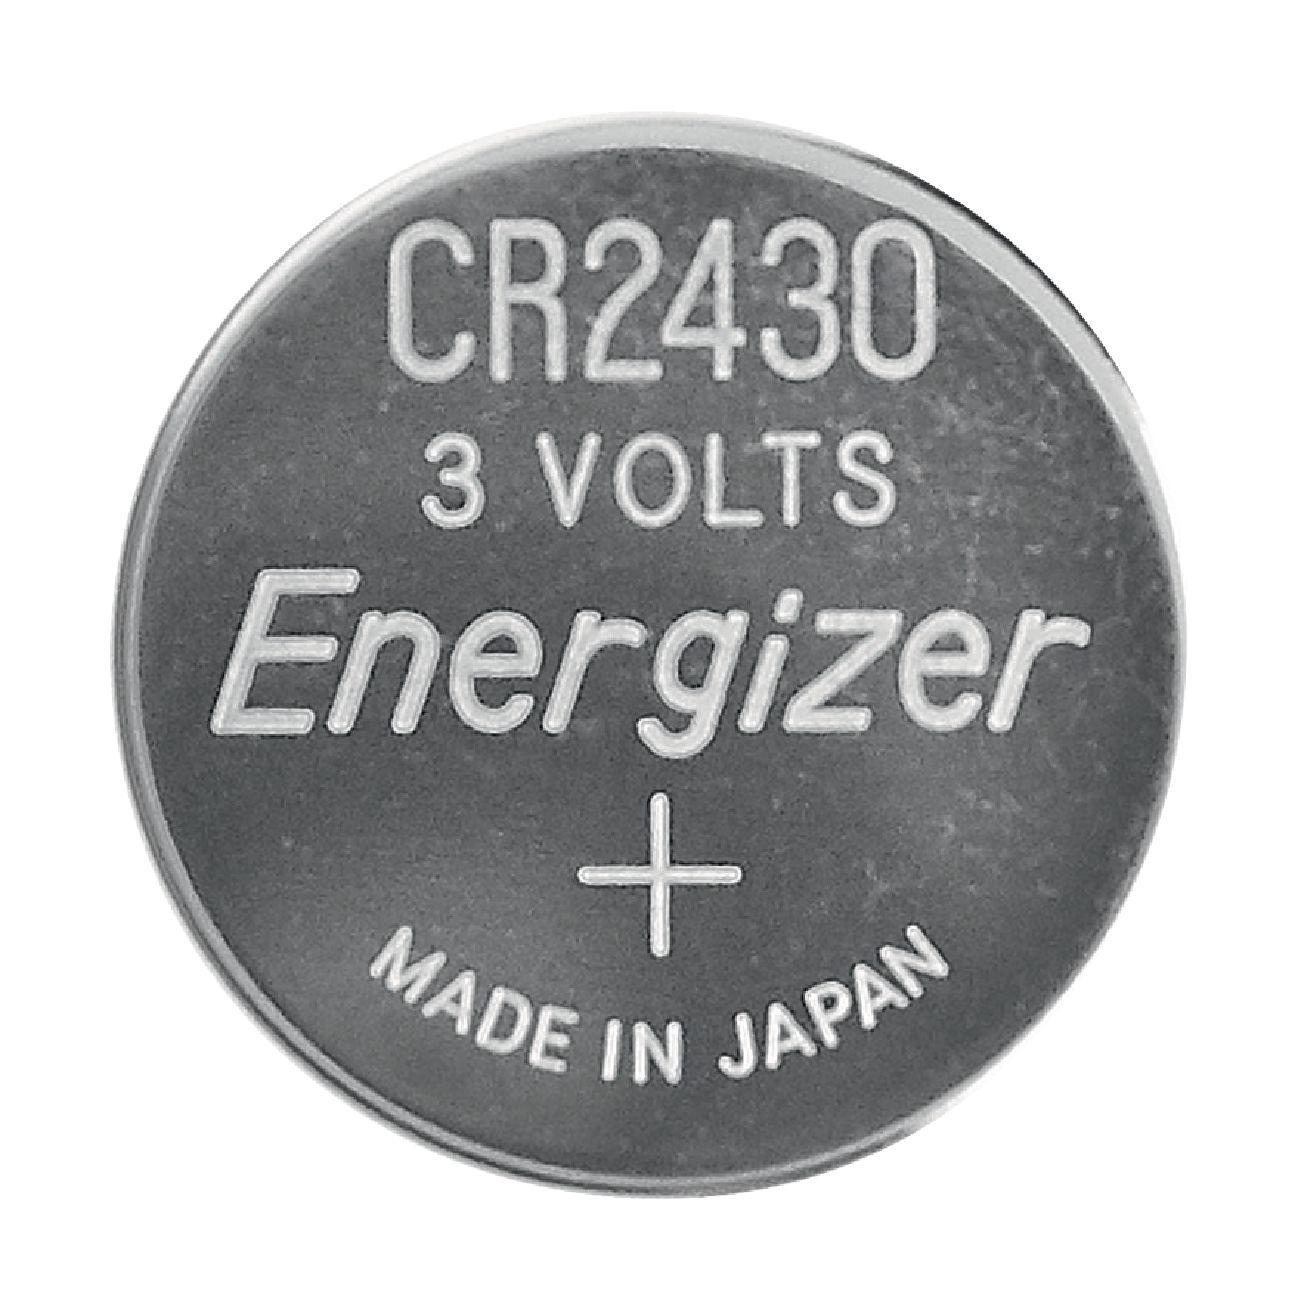 Lithiová Knoflíková Baterie CR2430 3 V 2-Blistr